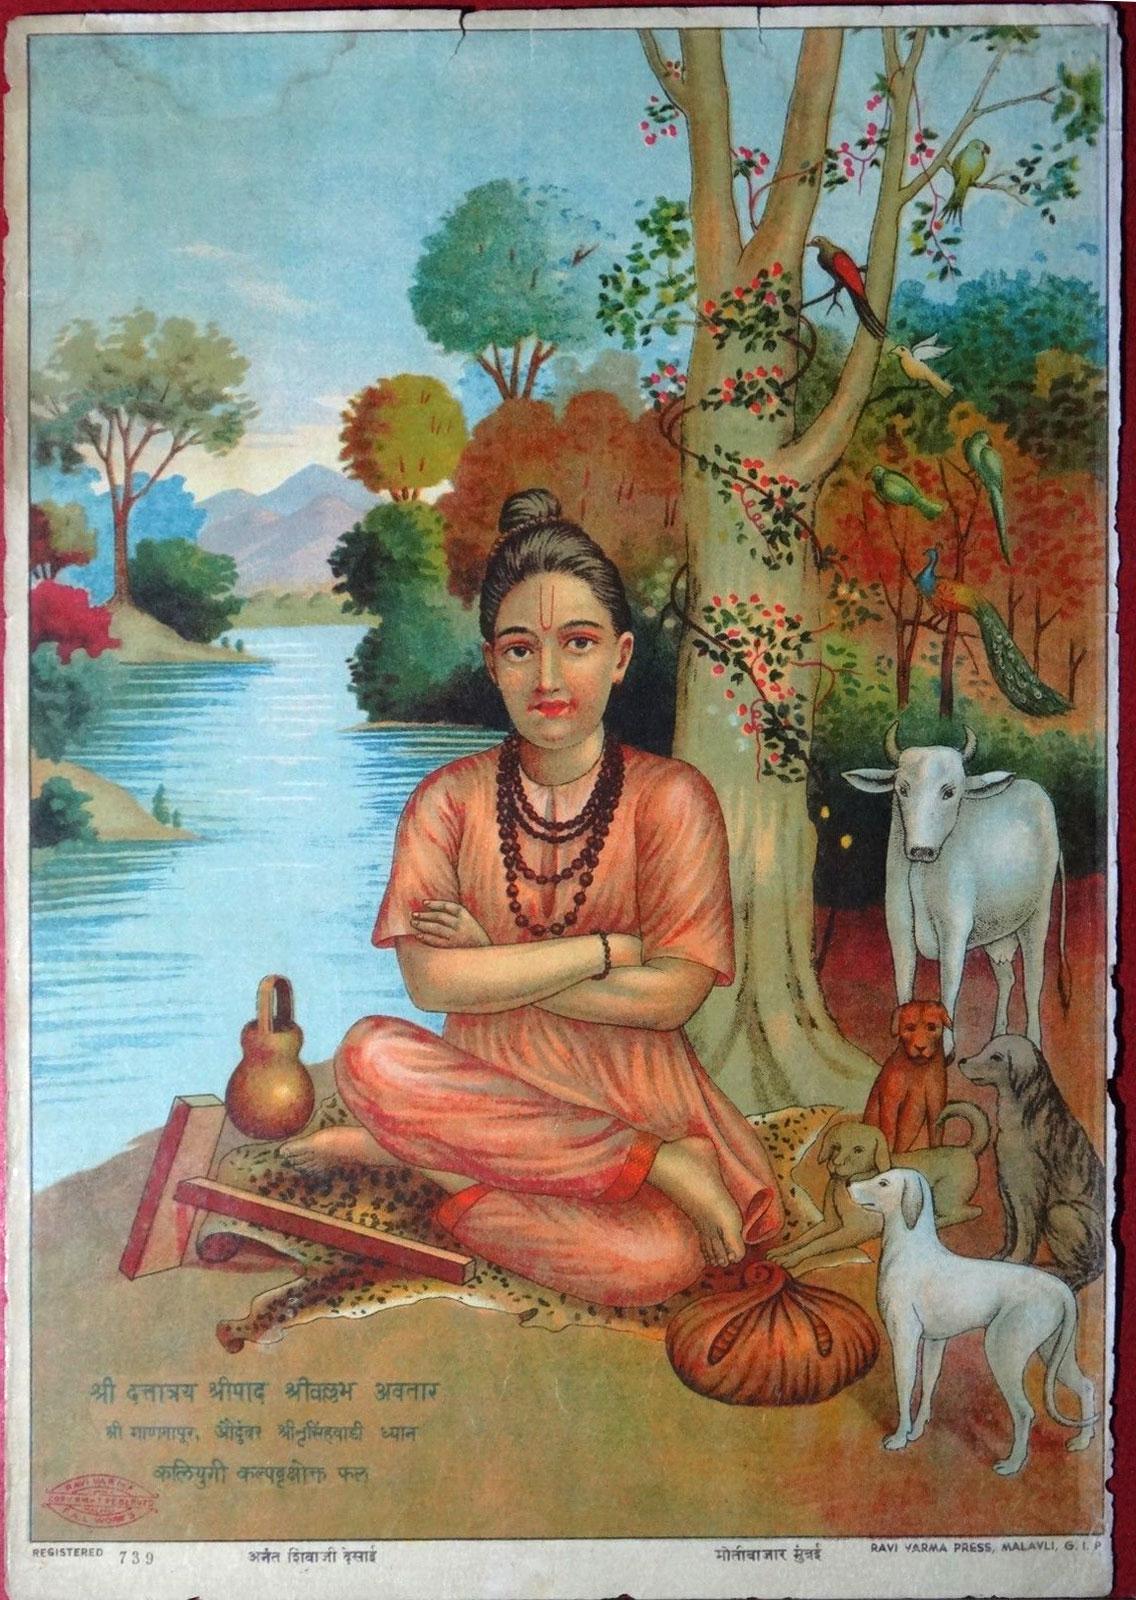 Dattatraya - Vintage Olegraph/Lithograph Print, Ravi Varma Press c1910-20